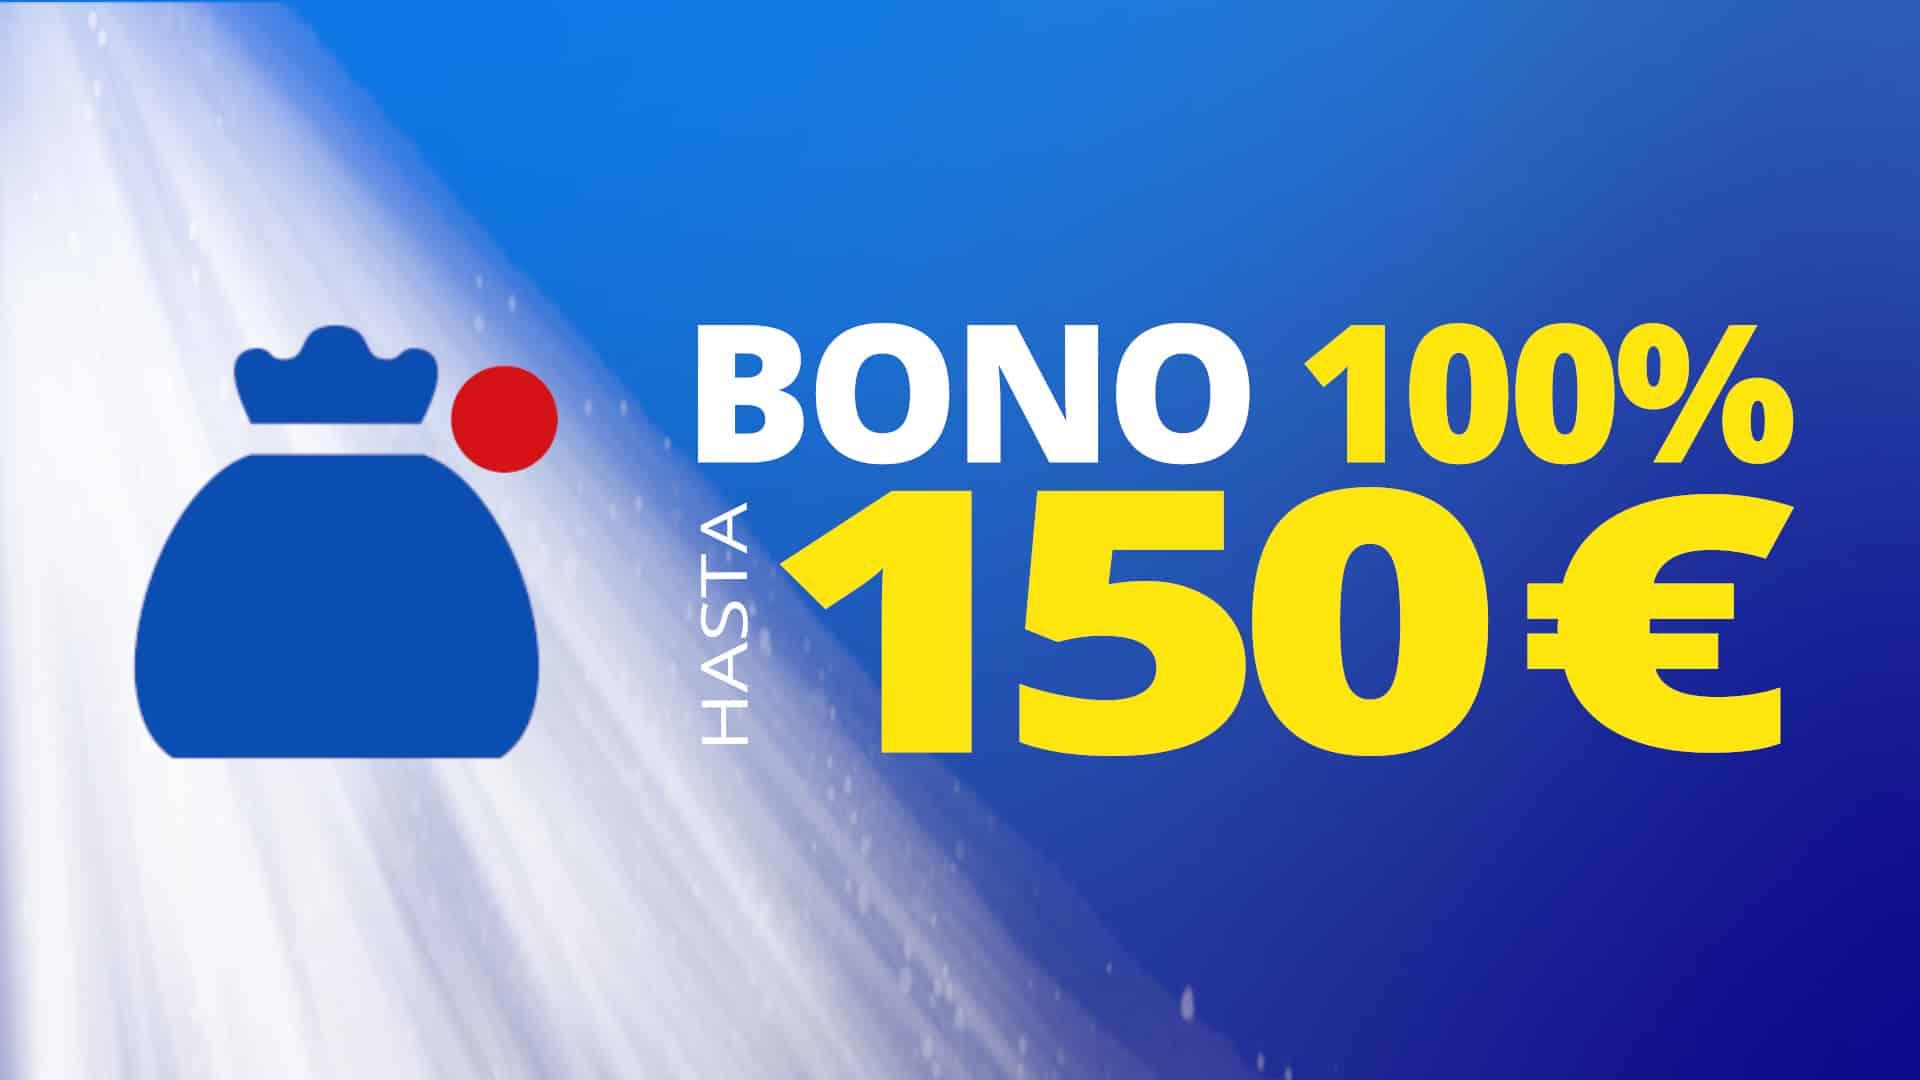 Bono hasta 150€